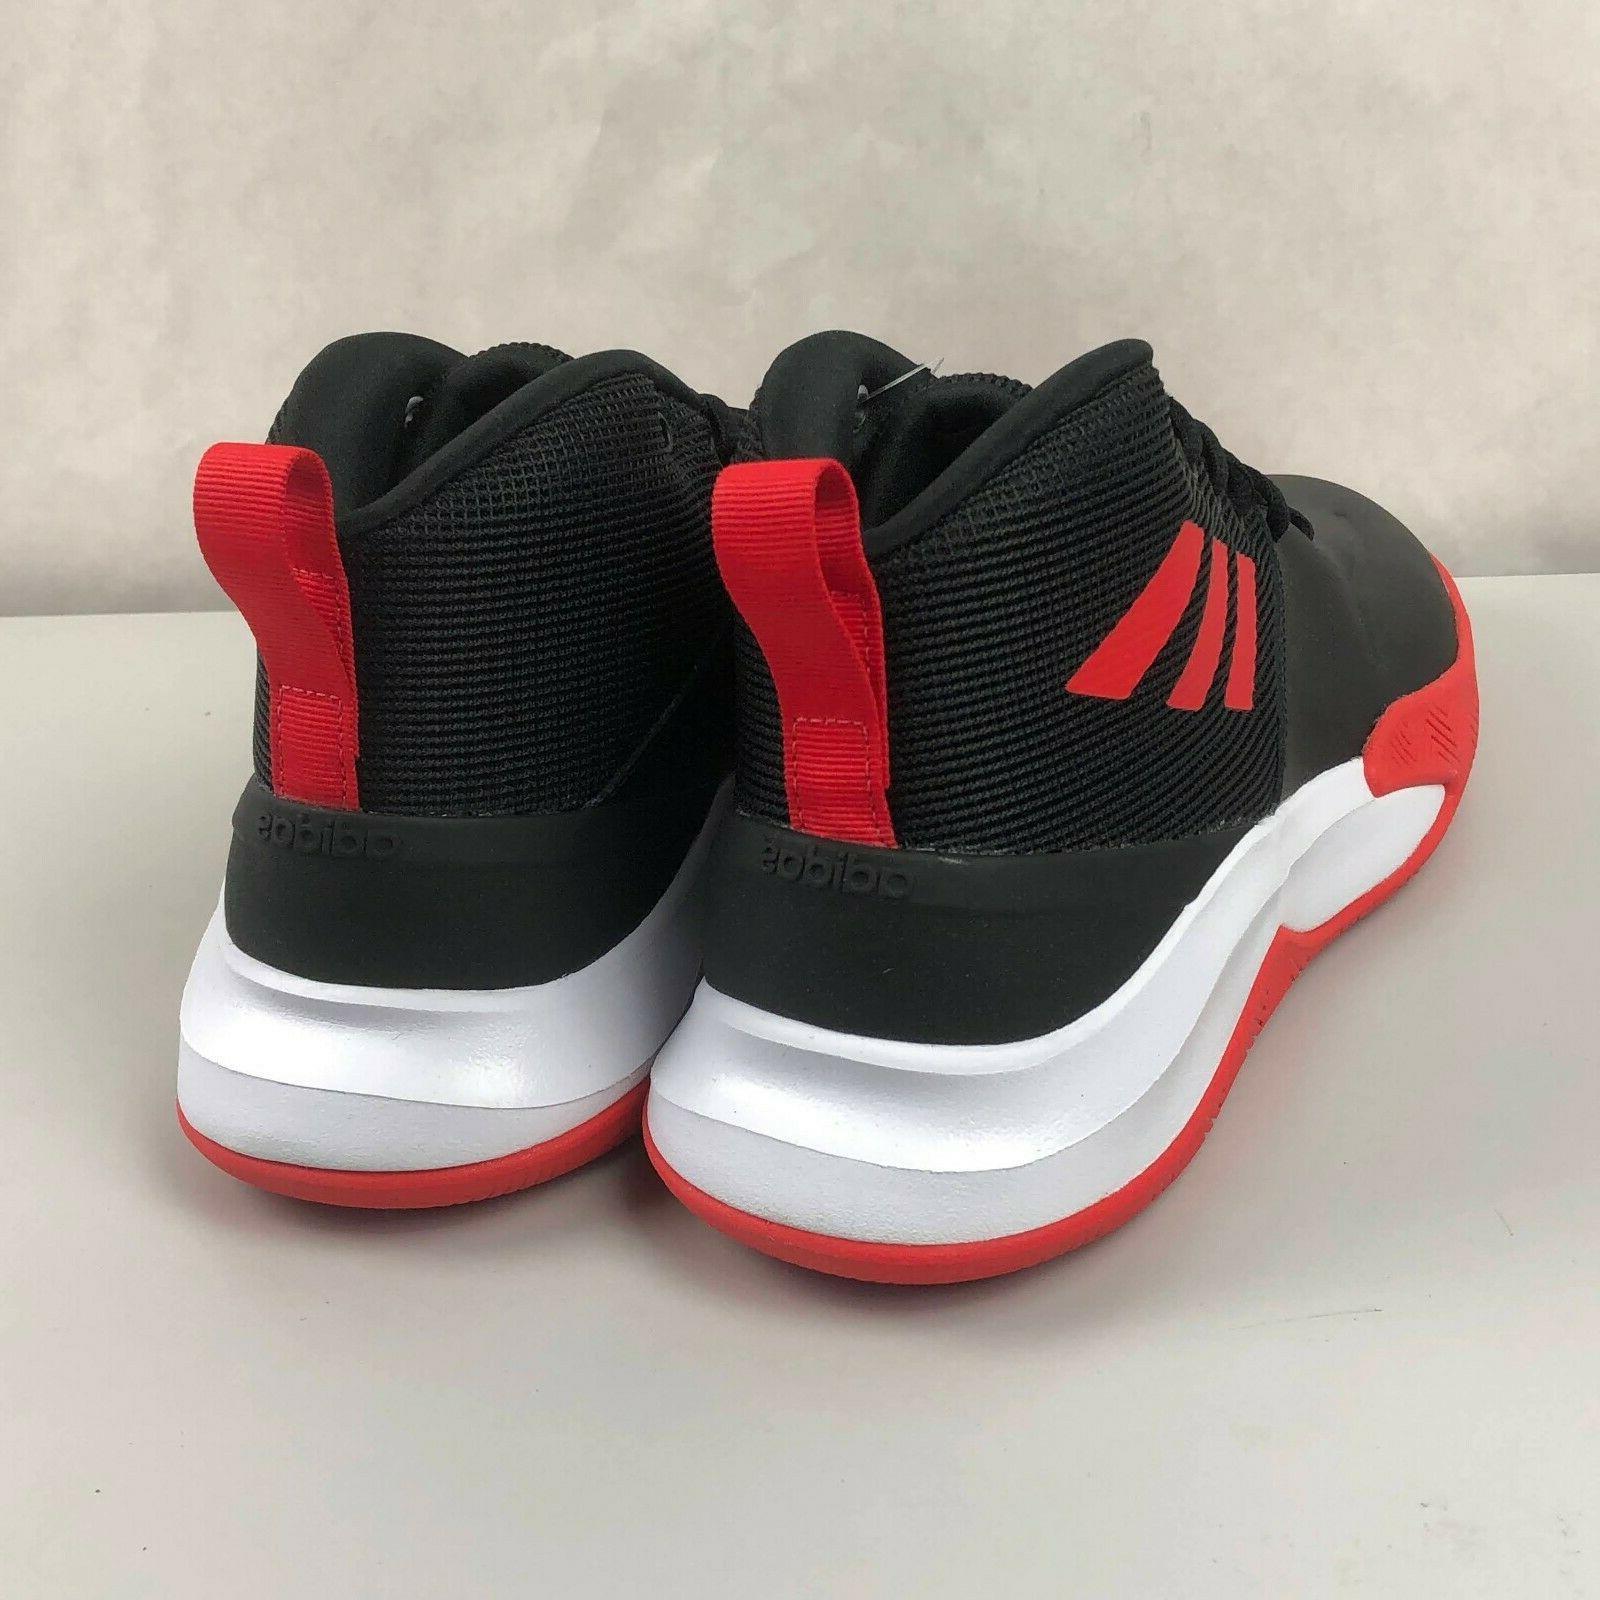 adidas OwnTheGame EF0746 Black/Active